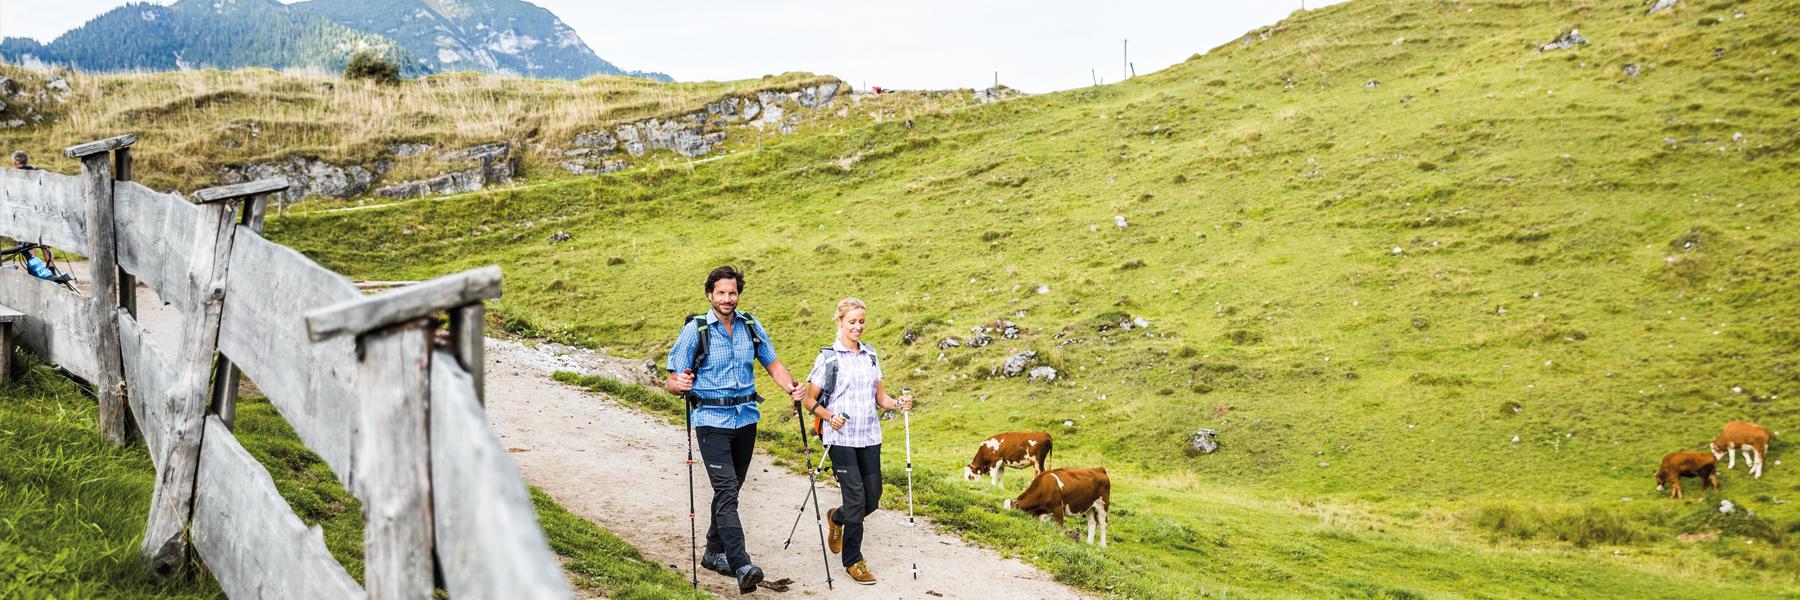 Wandern im PillerseeTal